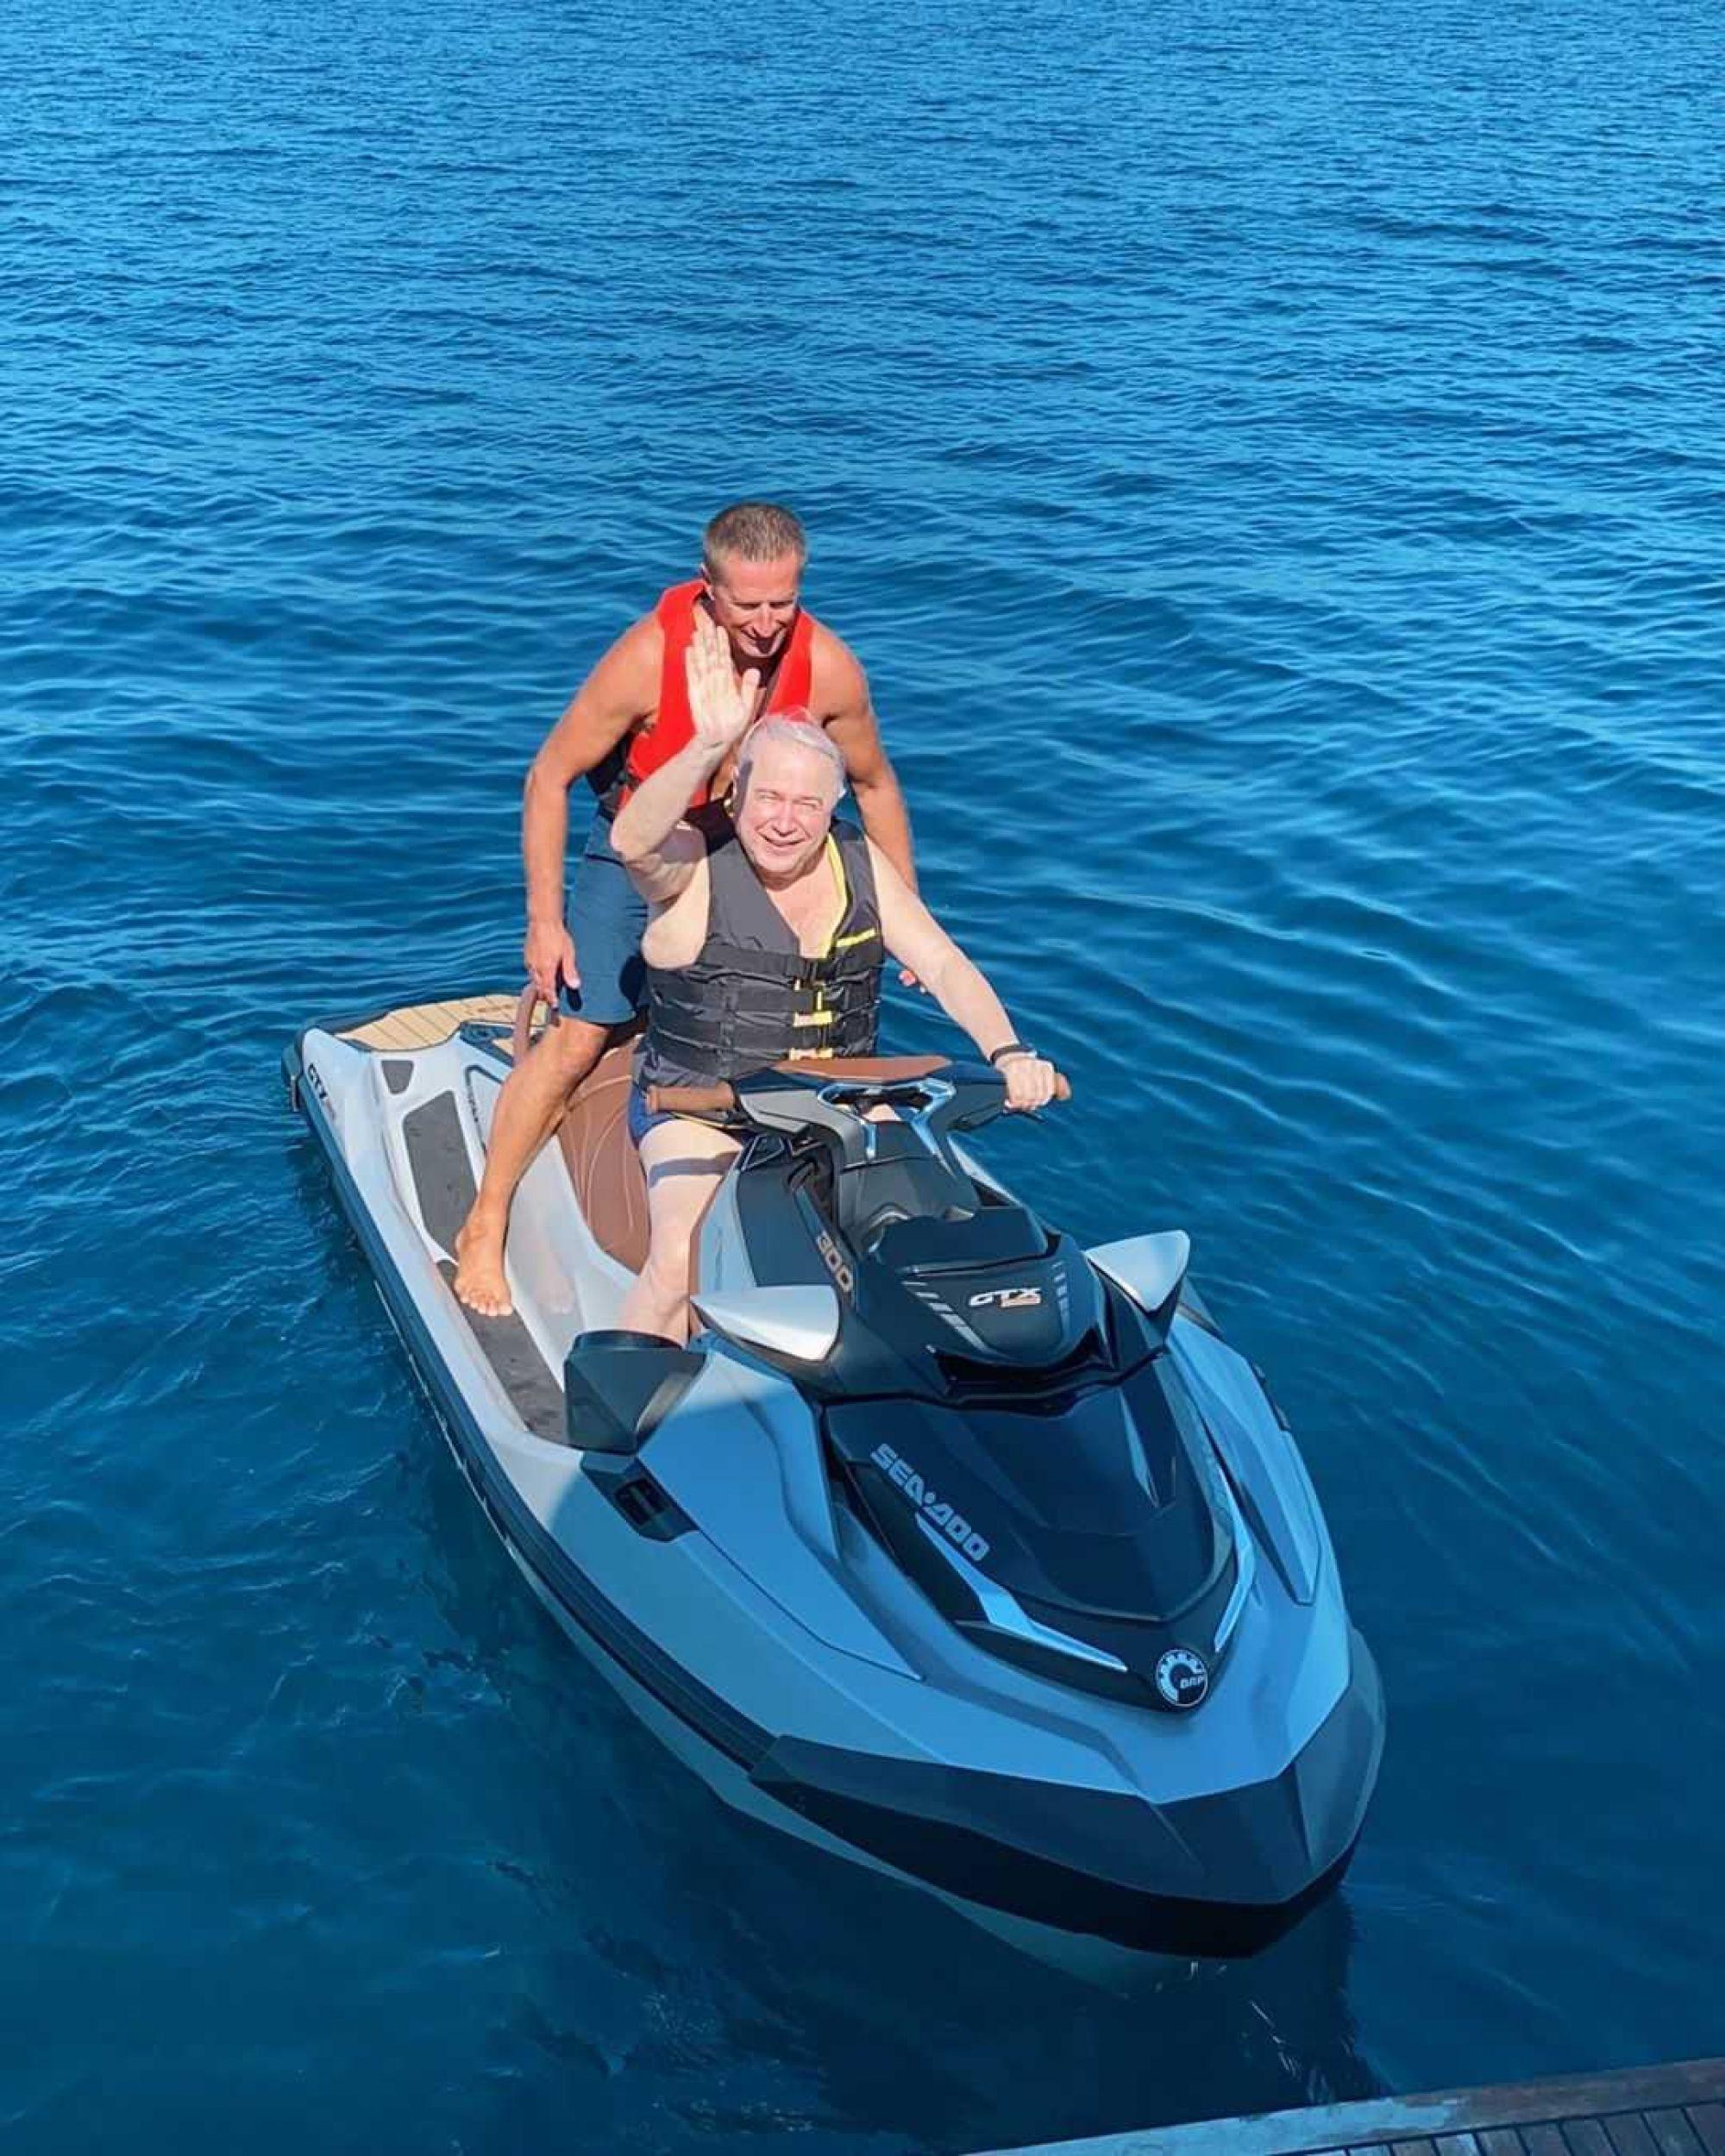 Евгений Петросян прокатился на скутере в открытом море